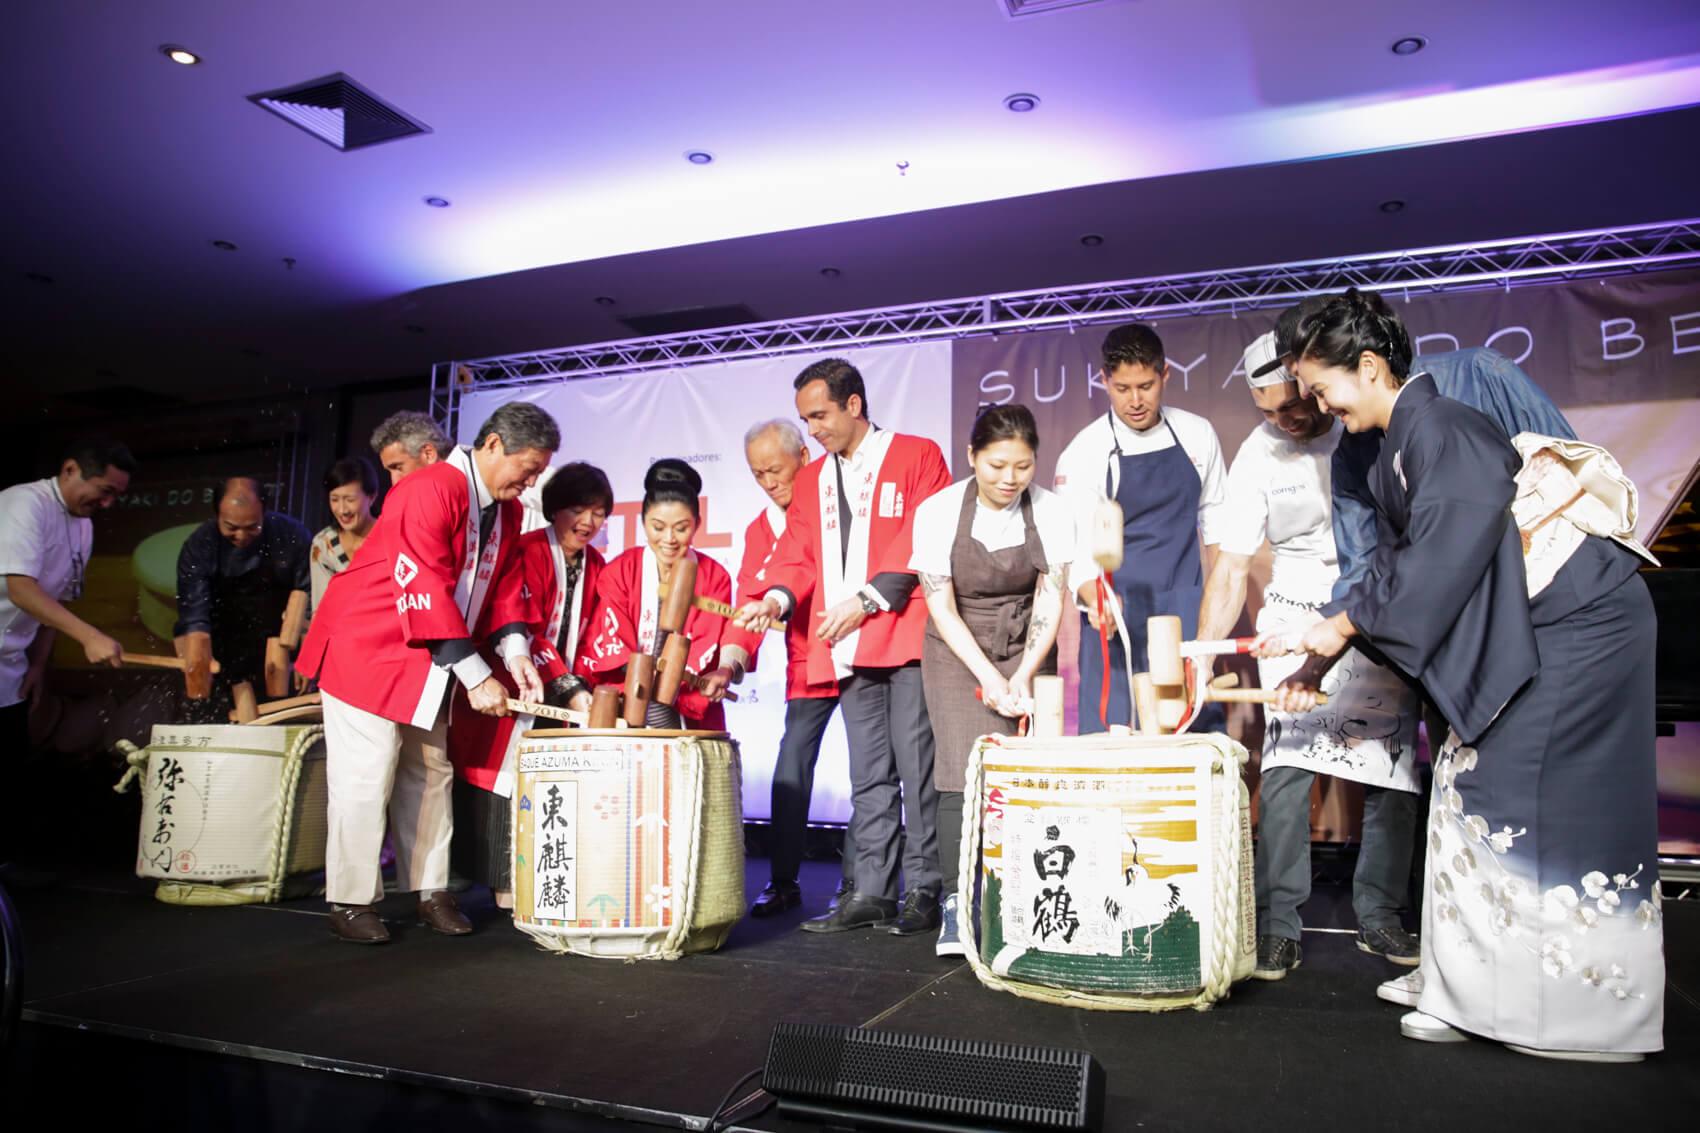 Abertura oficial com o kagami biraki no Sukiyaki do Bem 2017 - Sukiyaki do Bem 2017